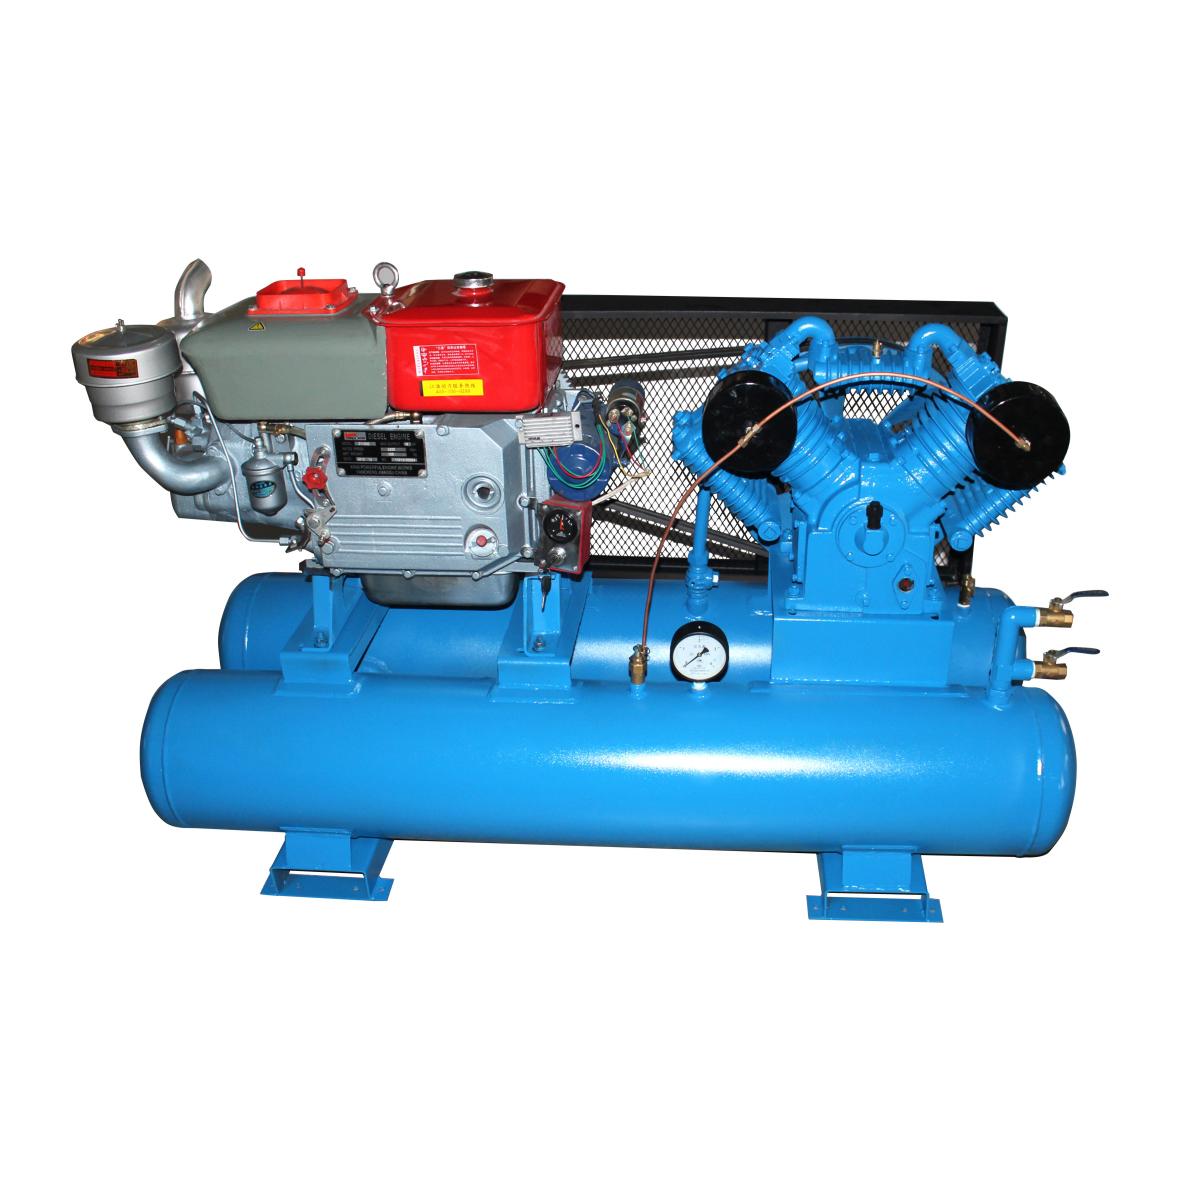 CV-1.05/12.5  Air Compressor Machine Featured Image